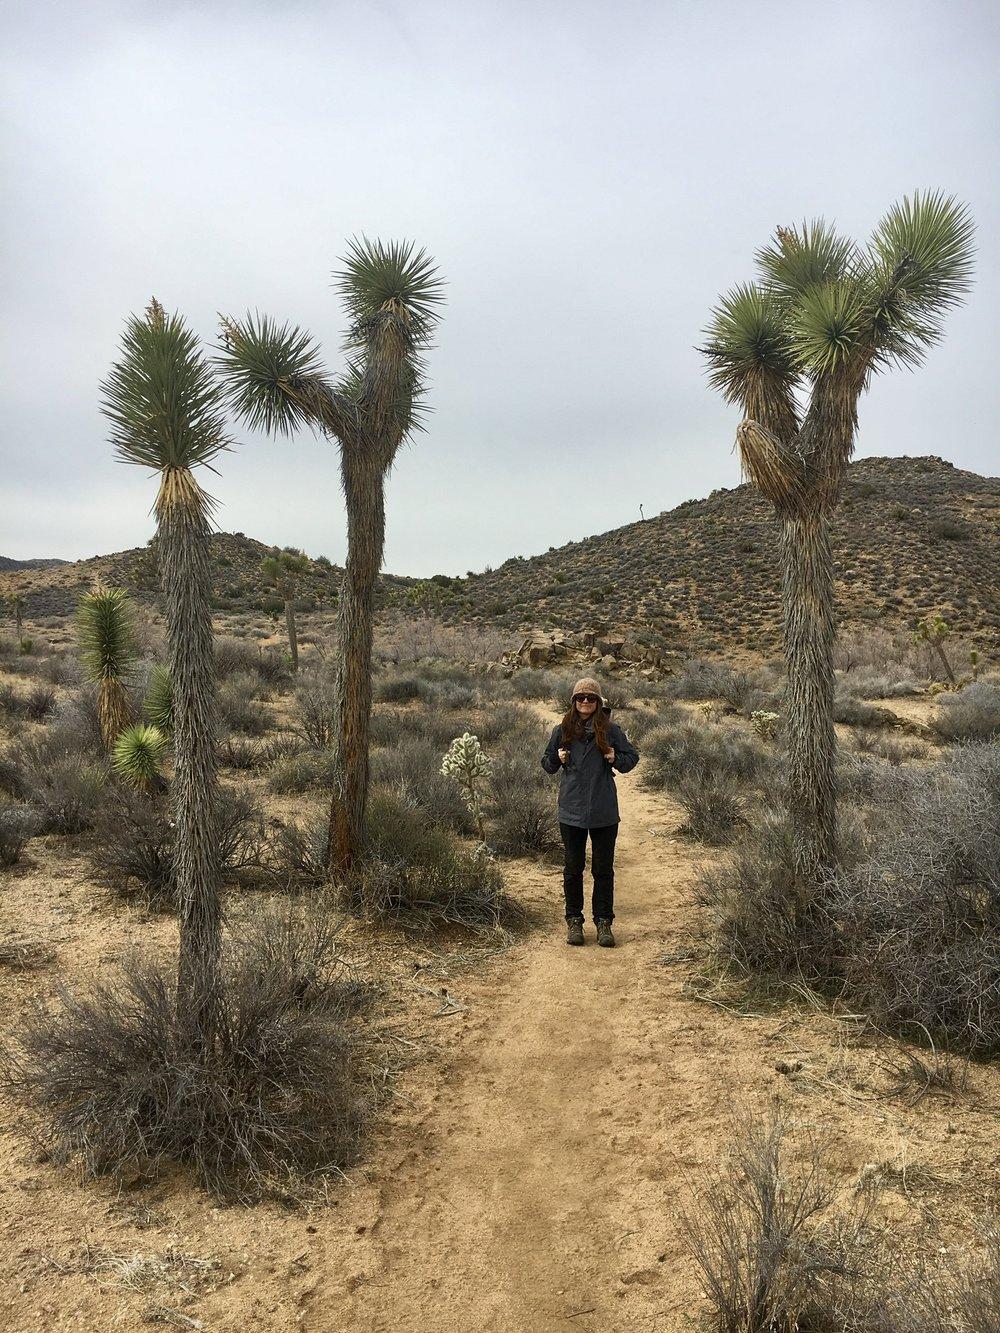 Cynthia hiking in the backcountry in Joshua Tree.